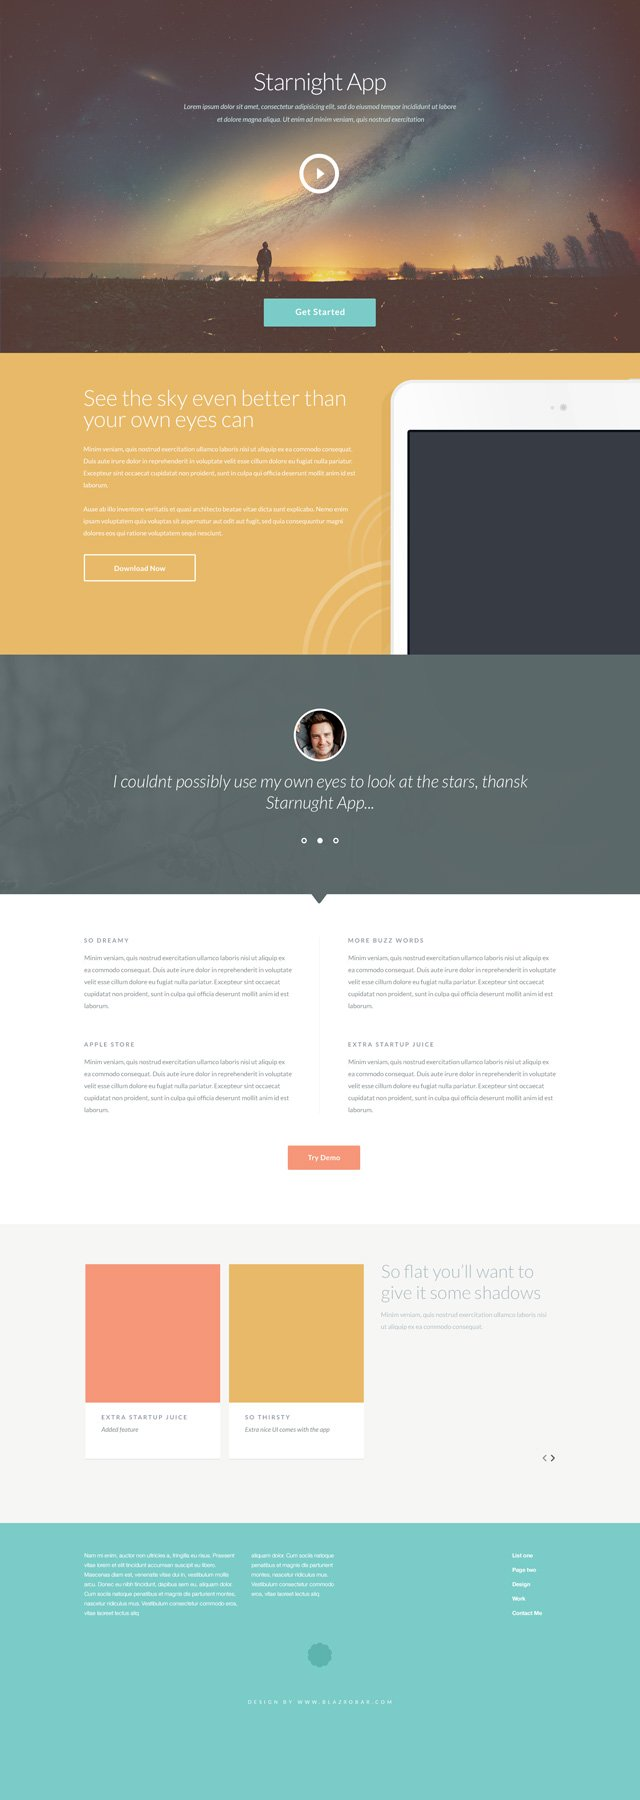 Шаблон сайта Starnight (HTML5 + .PSD) скачать бесплатно